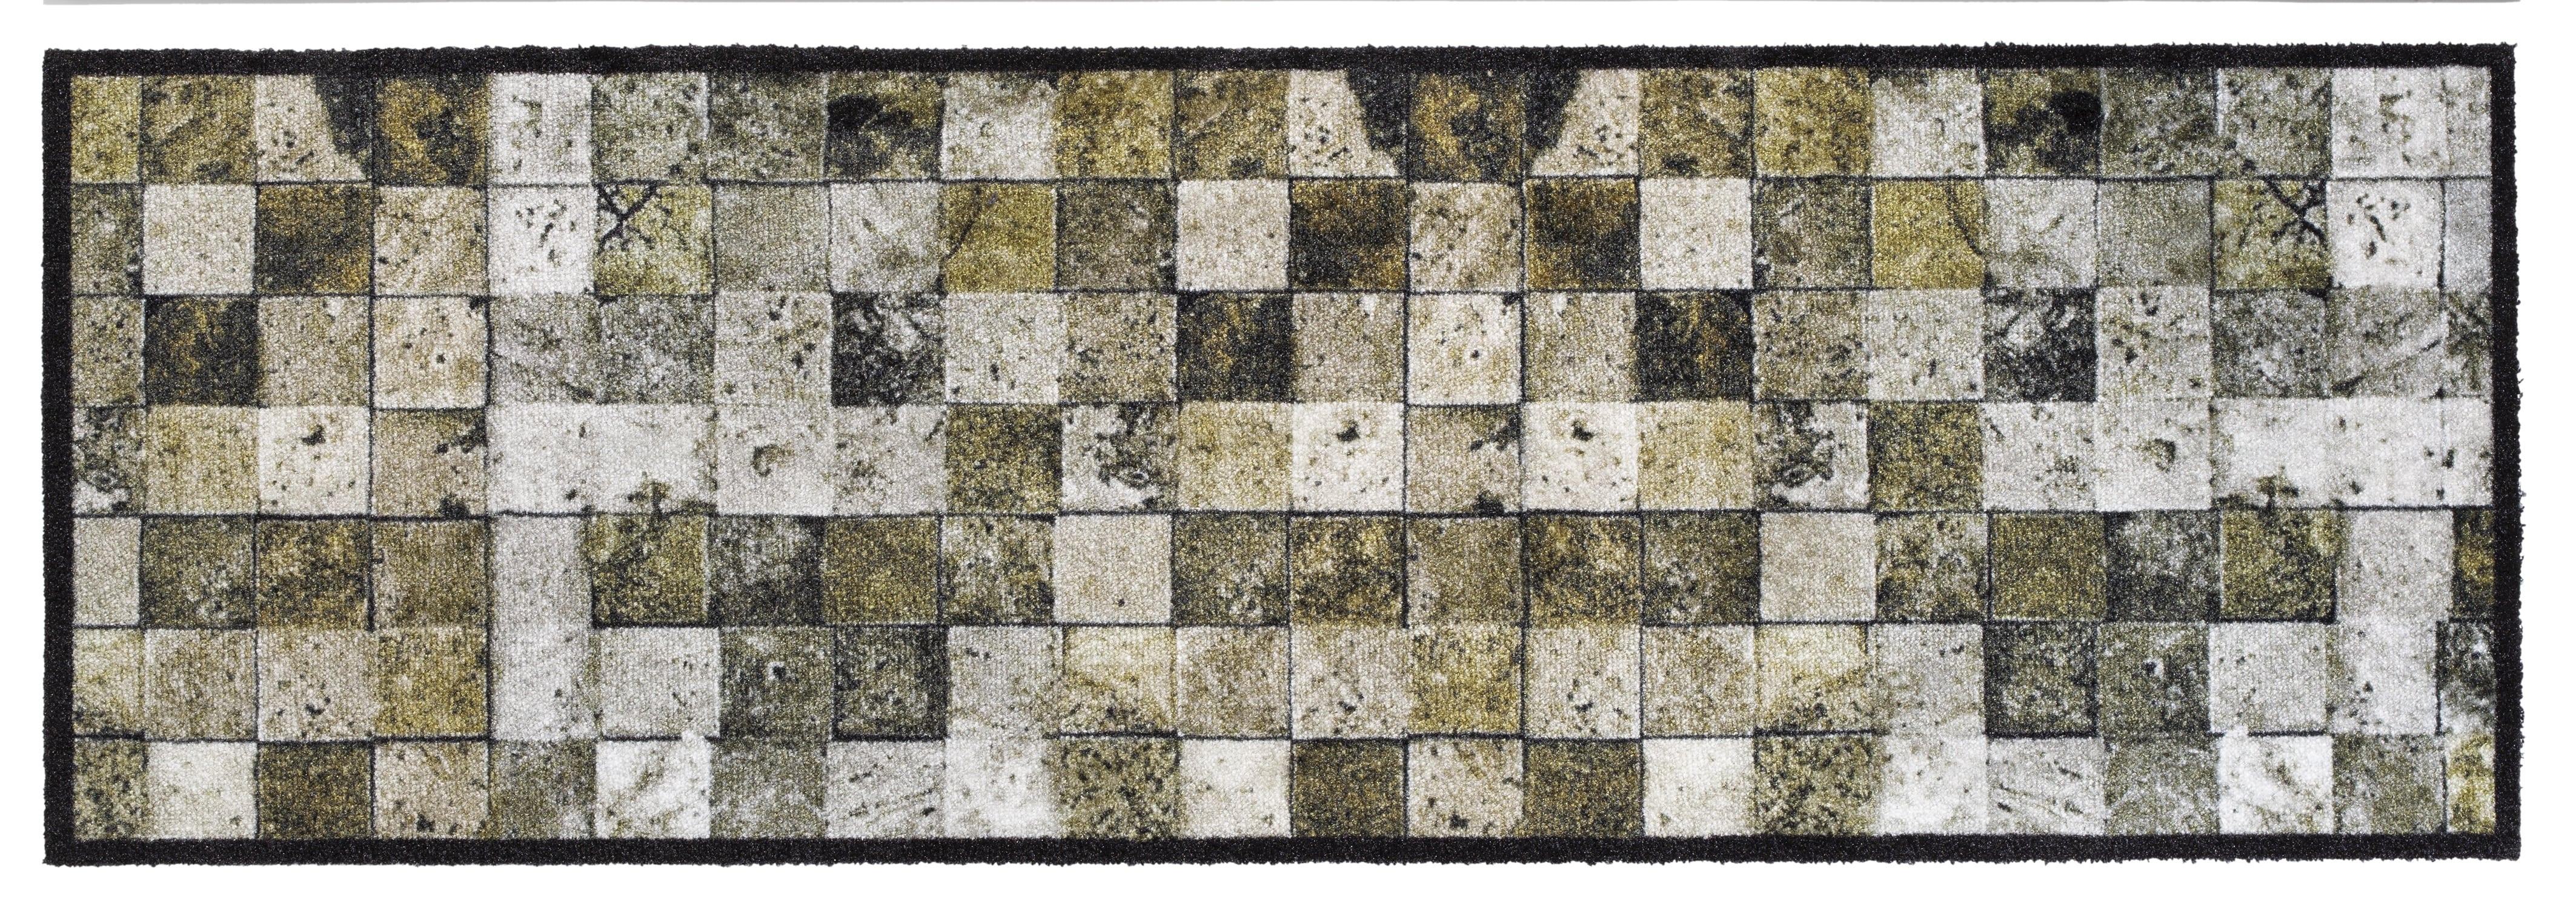 001 tiles 50×150